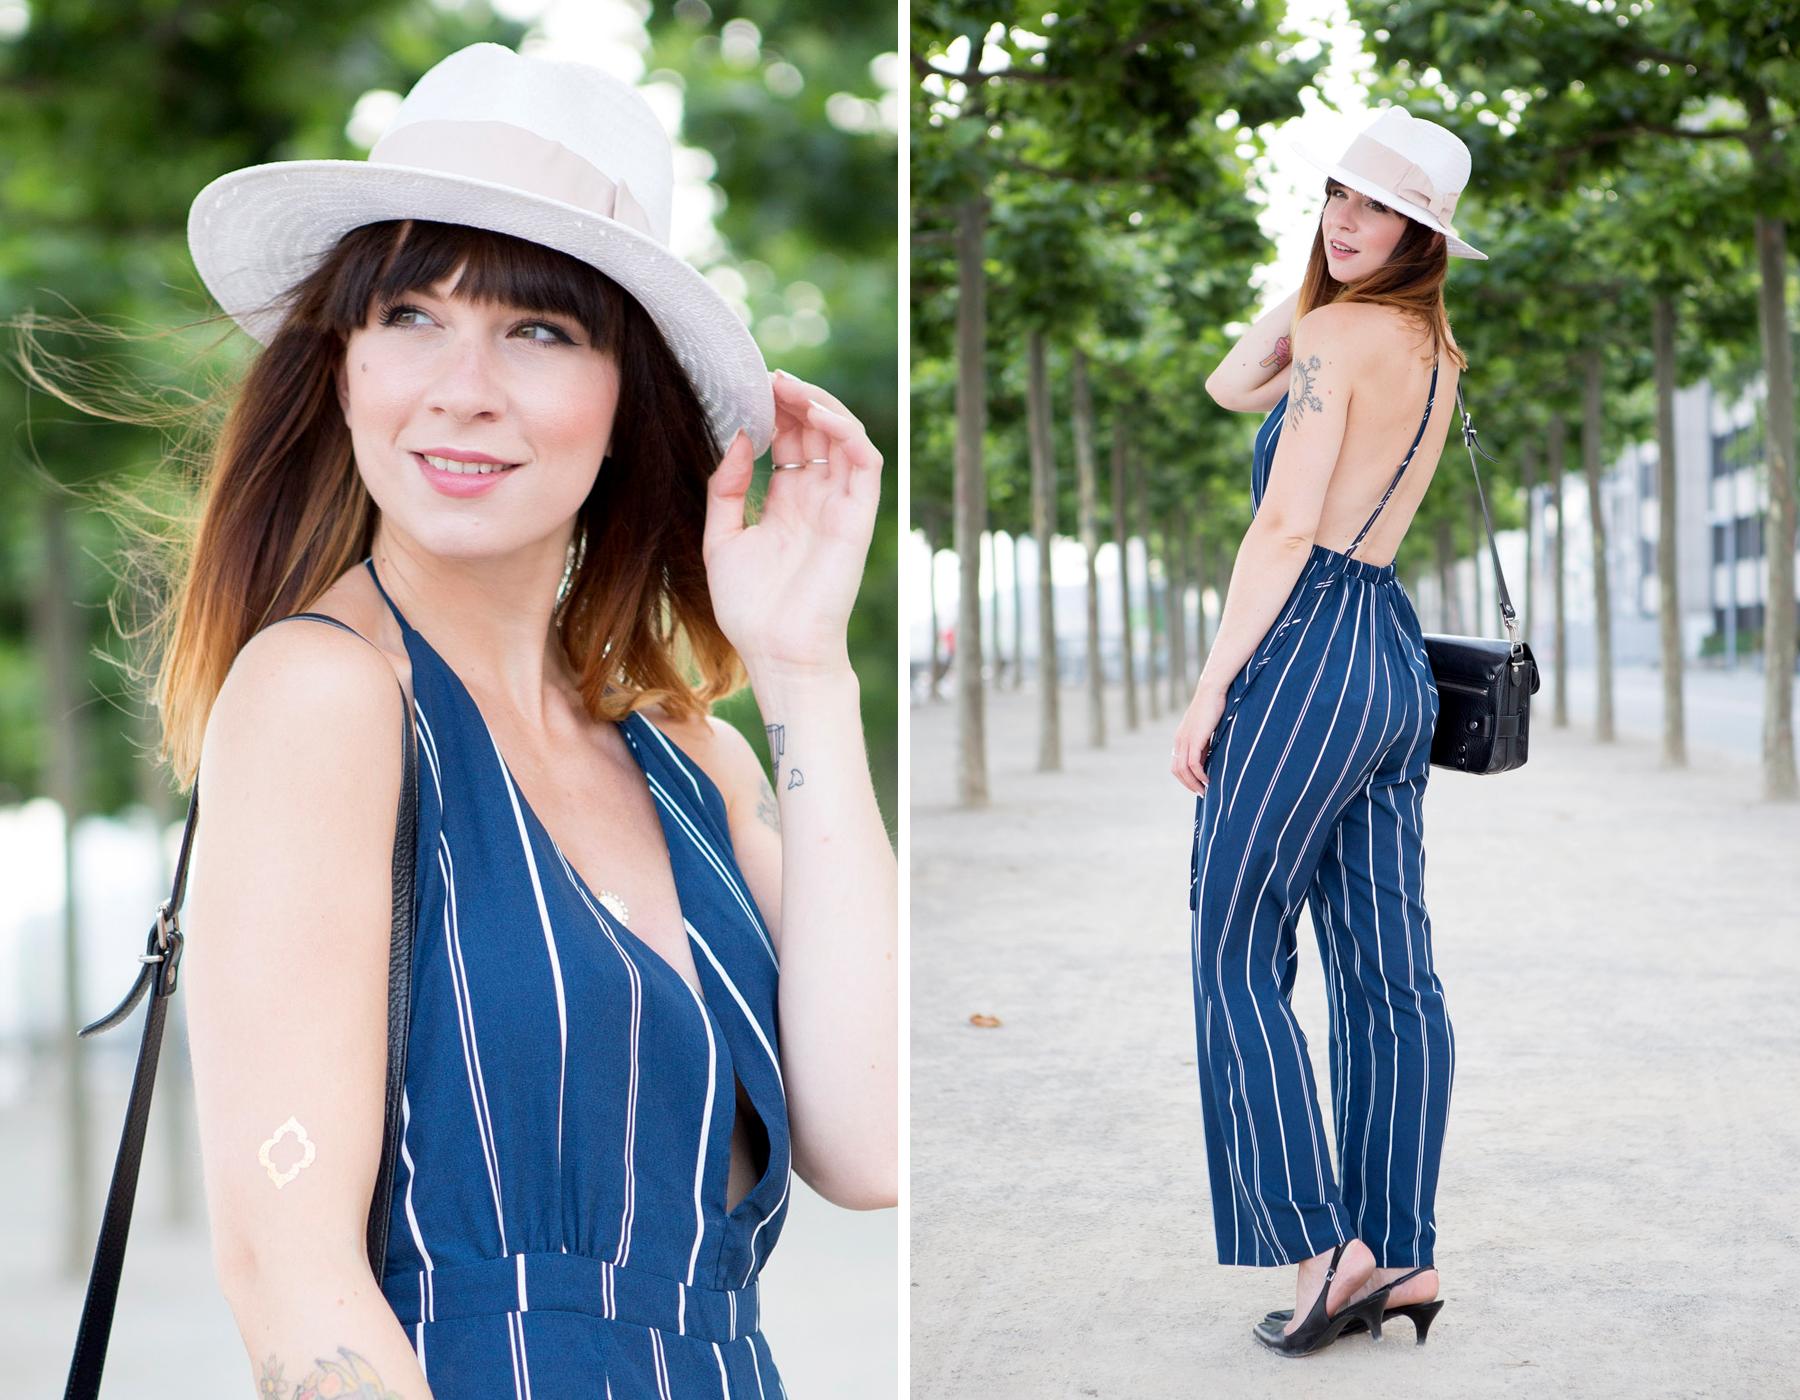 forever 21 jumpsuit overall streifen blue hat summer ombre cats & dogs ricarda schernus blogger berlin 1